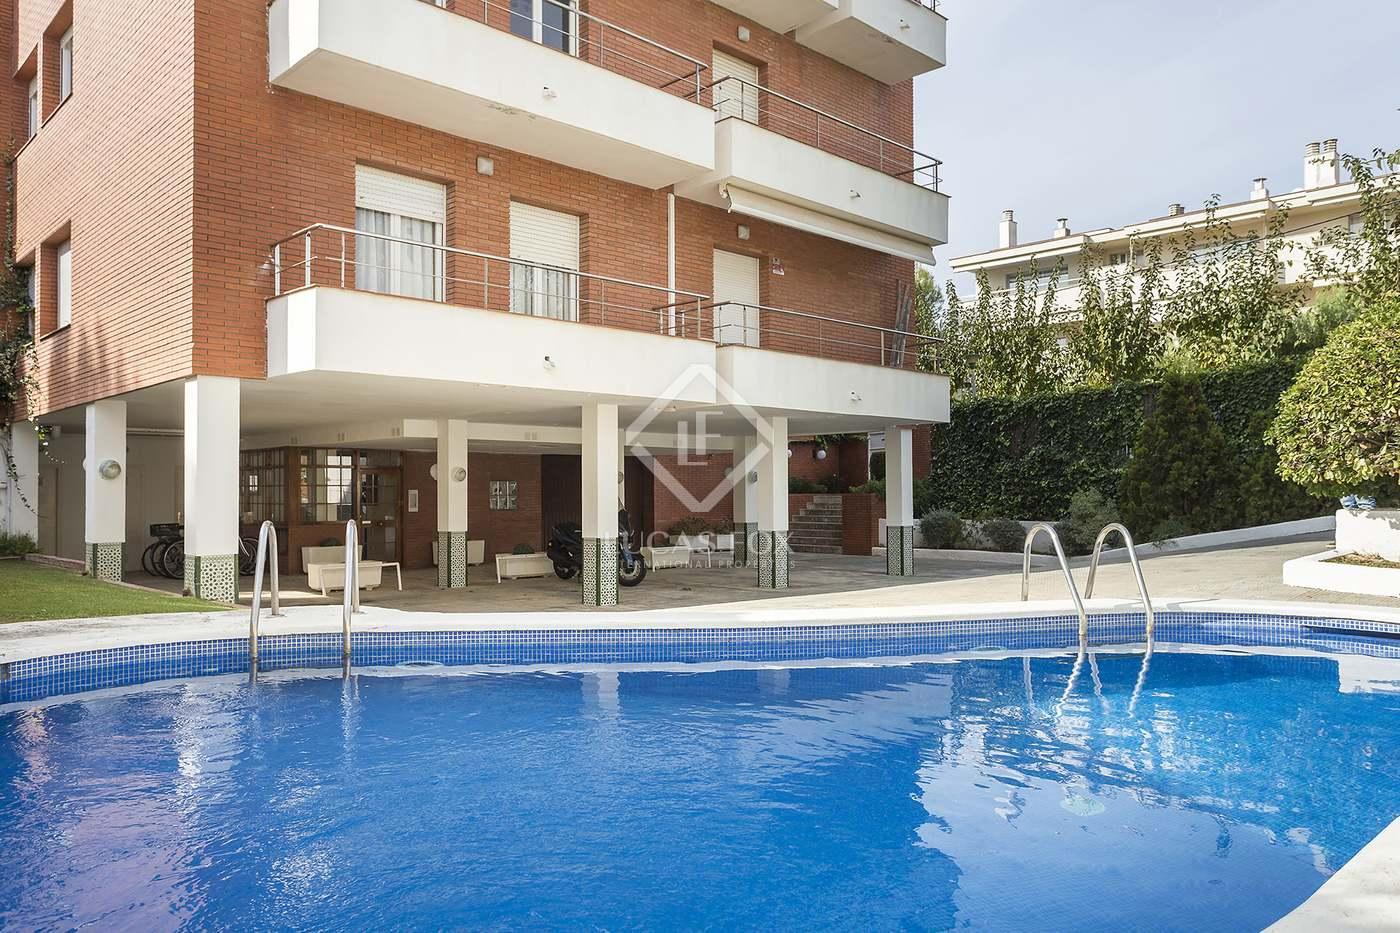 Piso en Terramar-Vinyet. Piso de 2 dormitorios en venta en terramar, barcelona